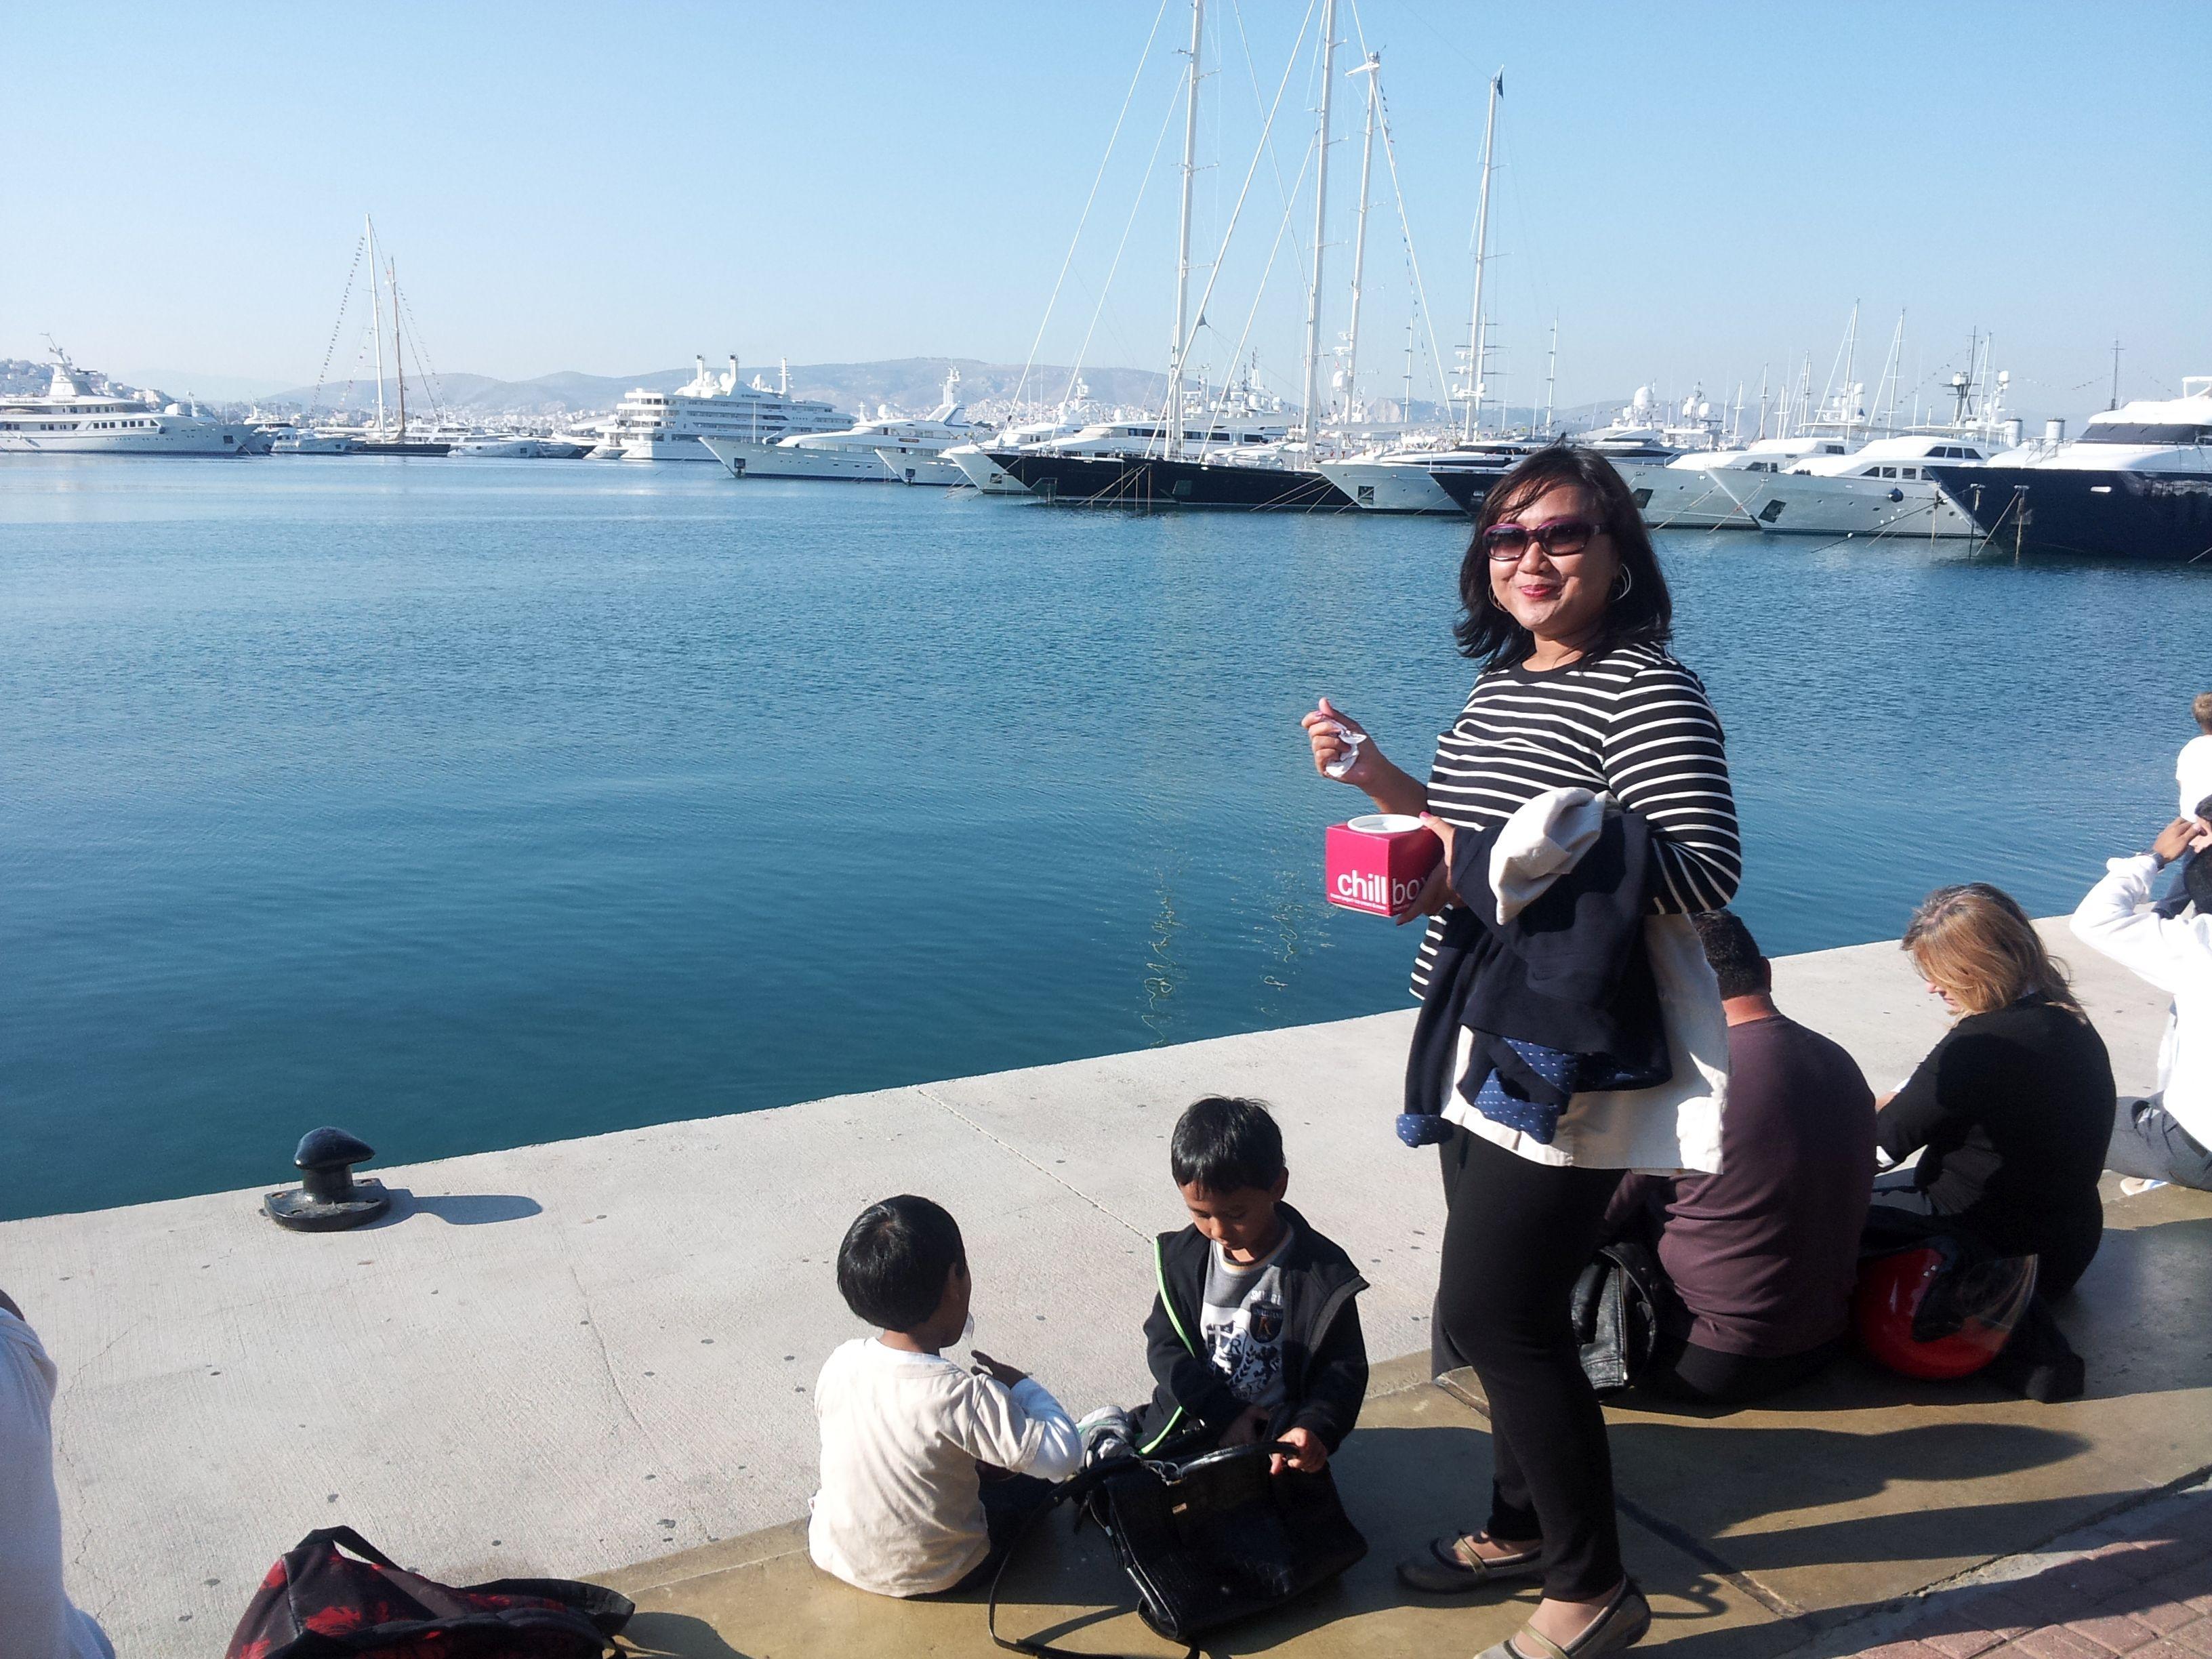 marina Flisvos di utara kota Athena, tempat hangout di tepi laut